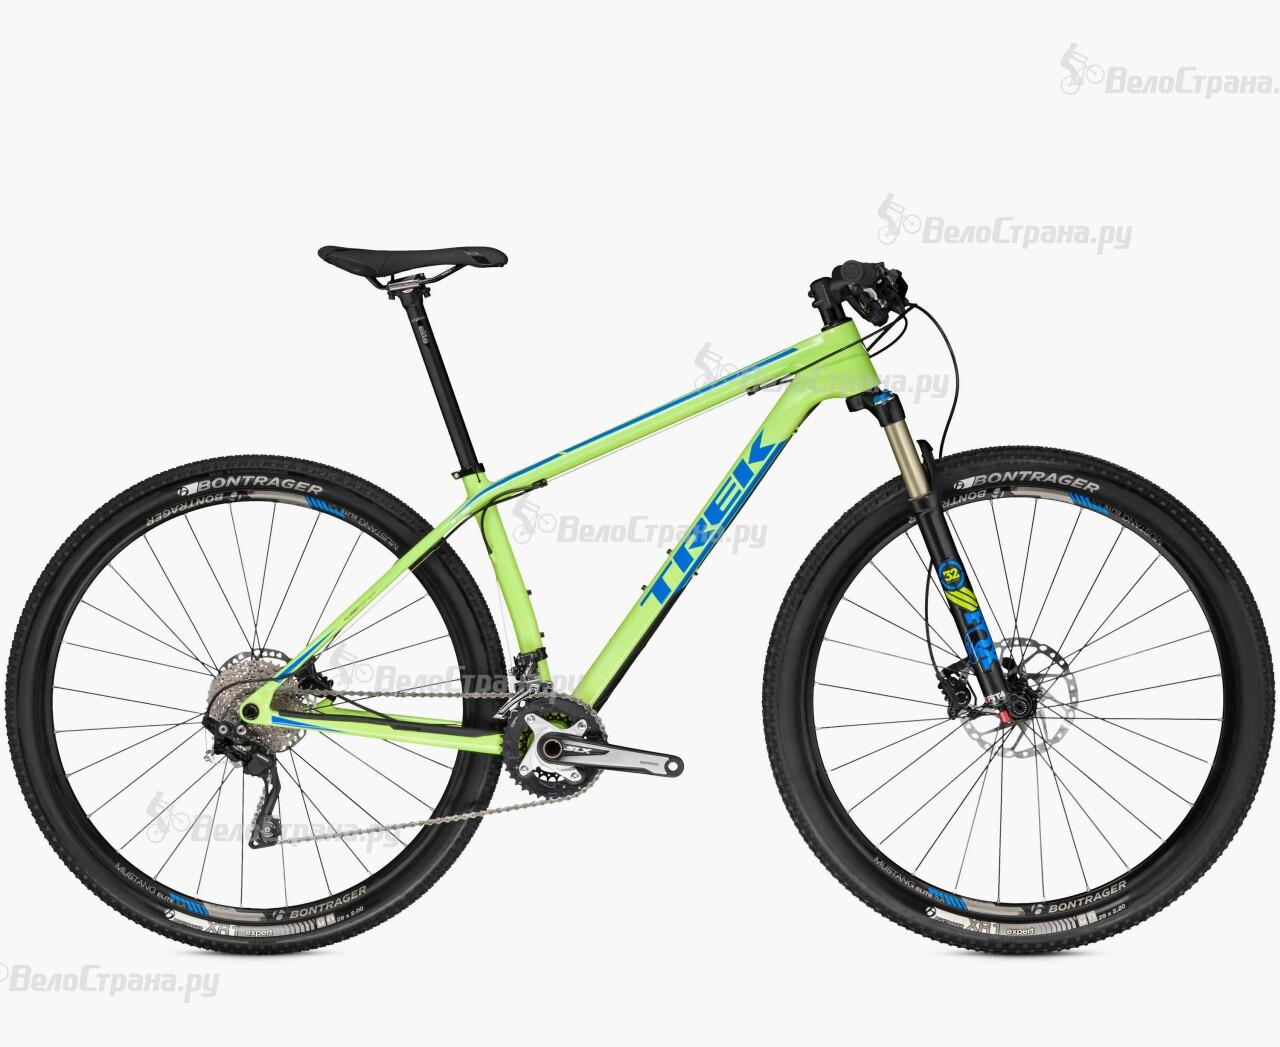 Велосипед Trek Superfly 9.7 29 (2016) велосипед trek marlin 4 29 2017